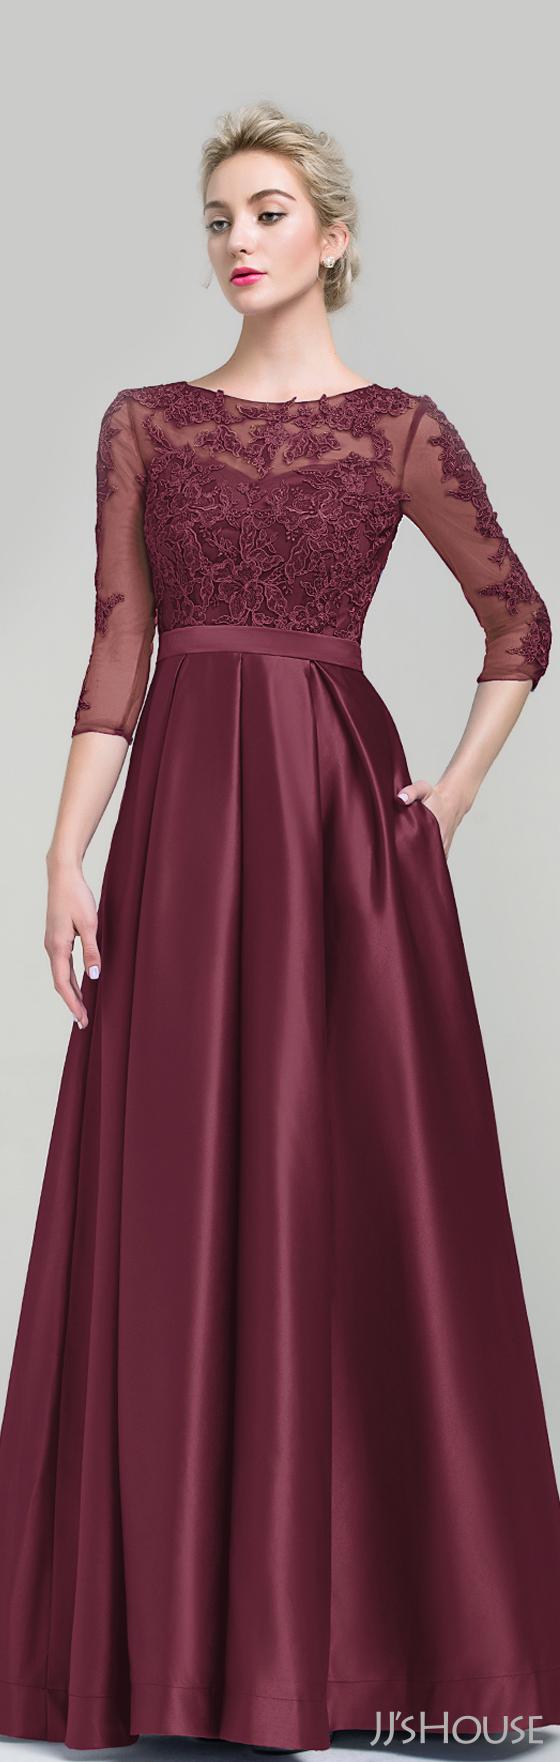 Ball-Gown Scoop Neck Floor-Length Satin Evening Dress (017093487 ...